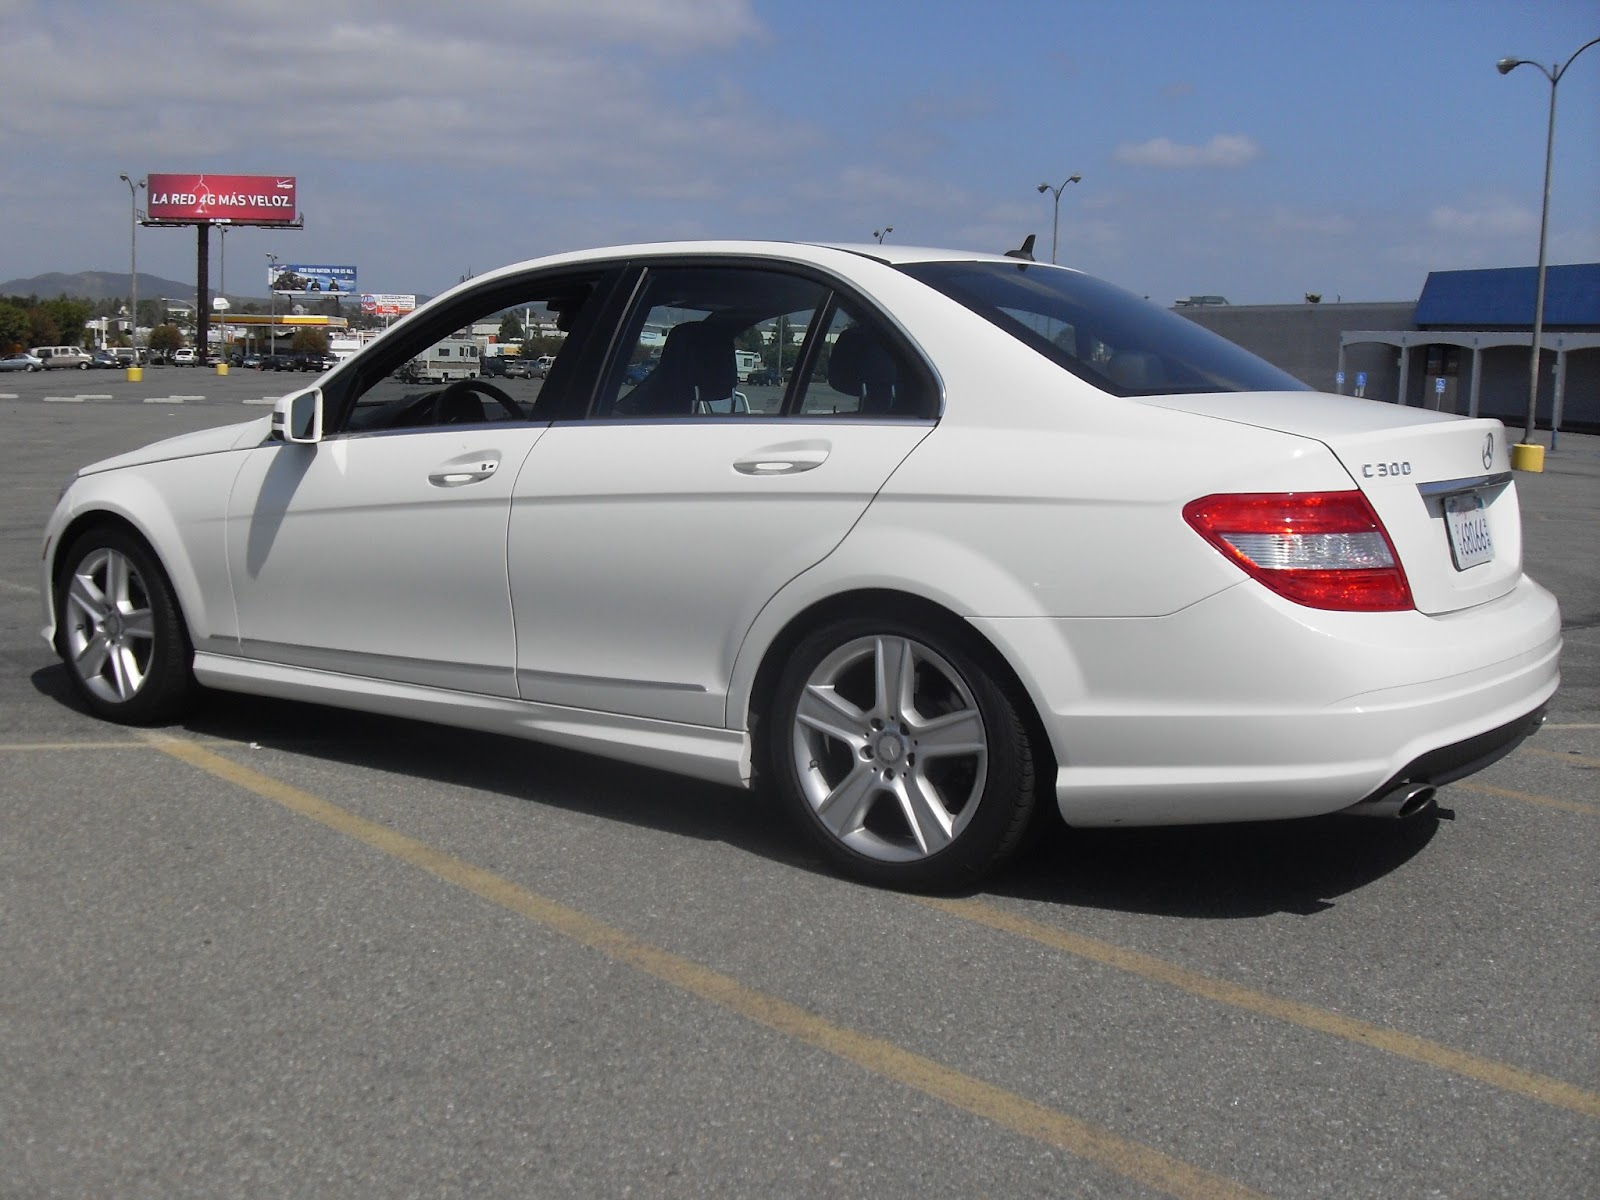 2010 mercedes benz c300 white t tak auto service for Mercedes benz schedule c service